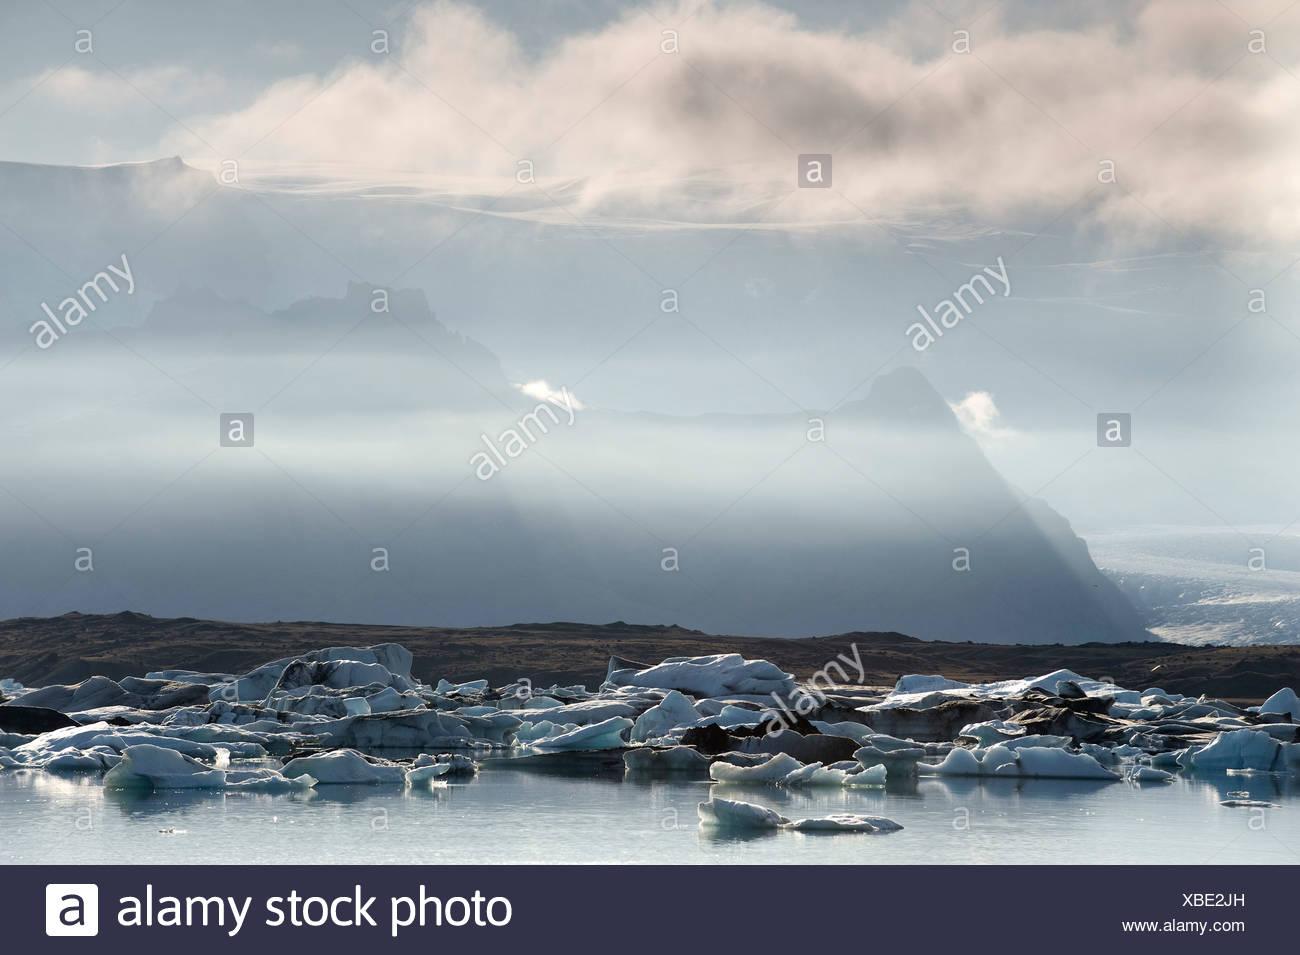 Icebergs floating in the Joekulsarlon glacier lagoon, South Iceland, Europe - Stock Image